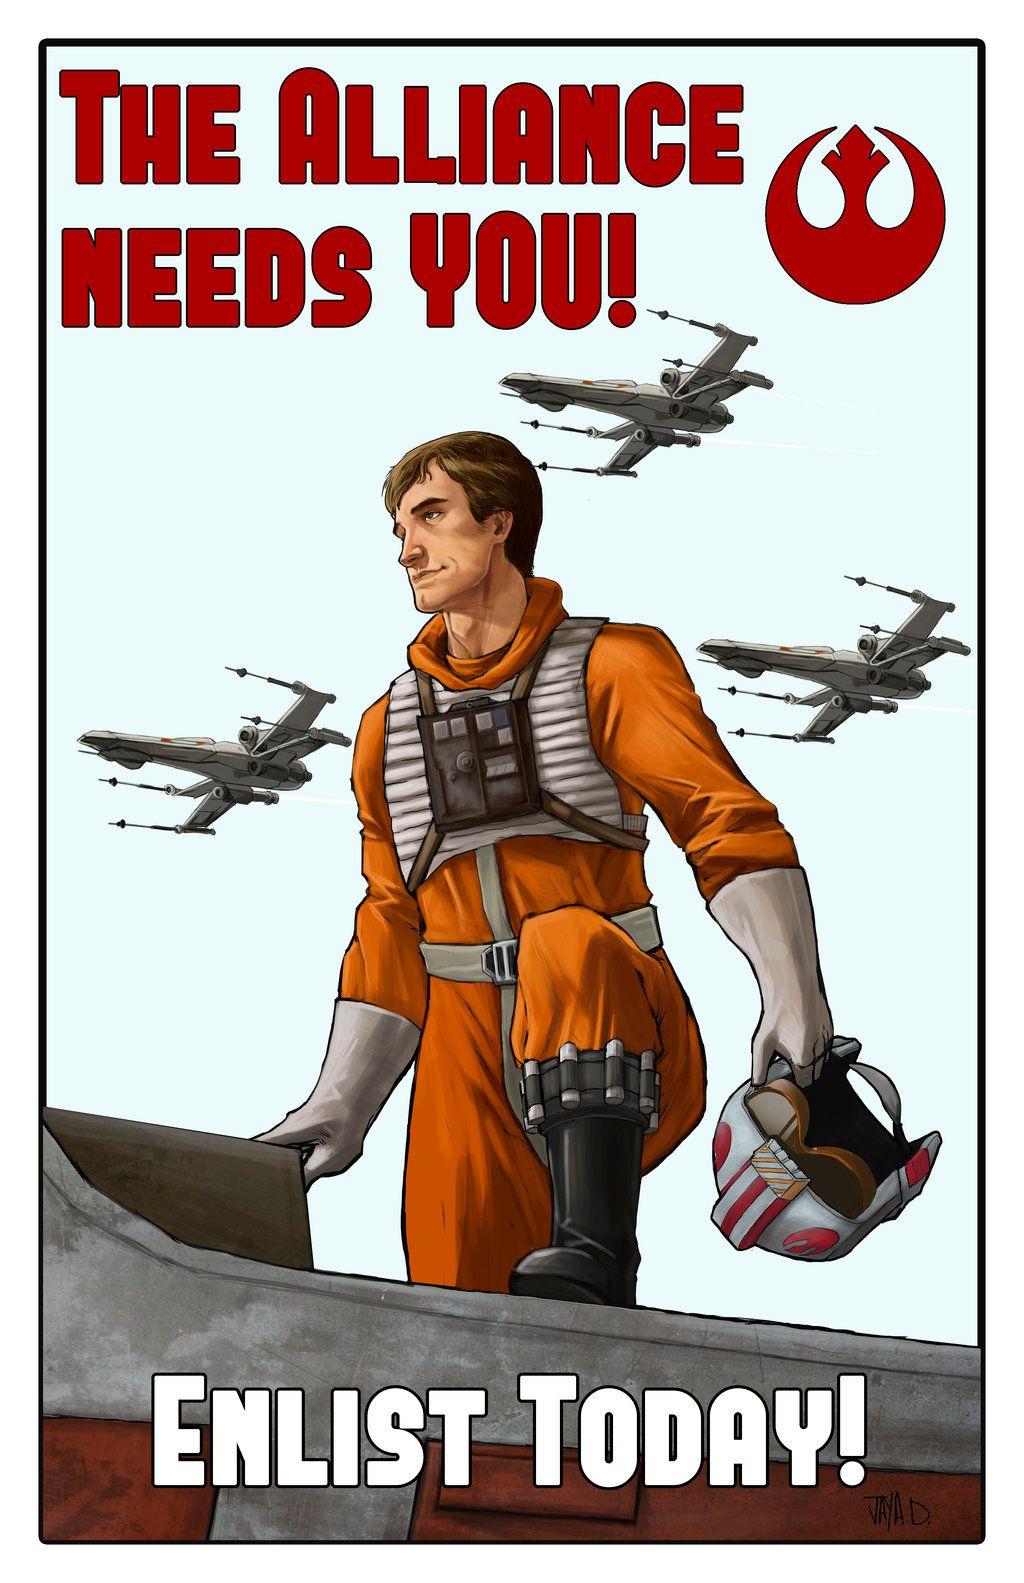 Star Wars ~ Rebel Alliance  Propaganda by Harpokrates